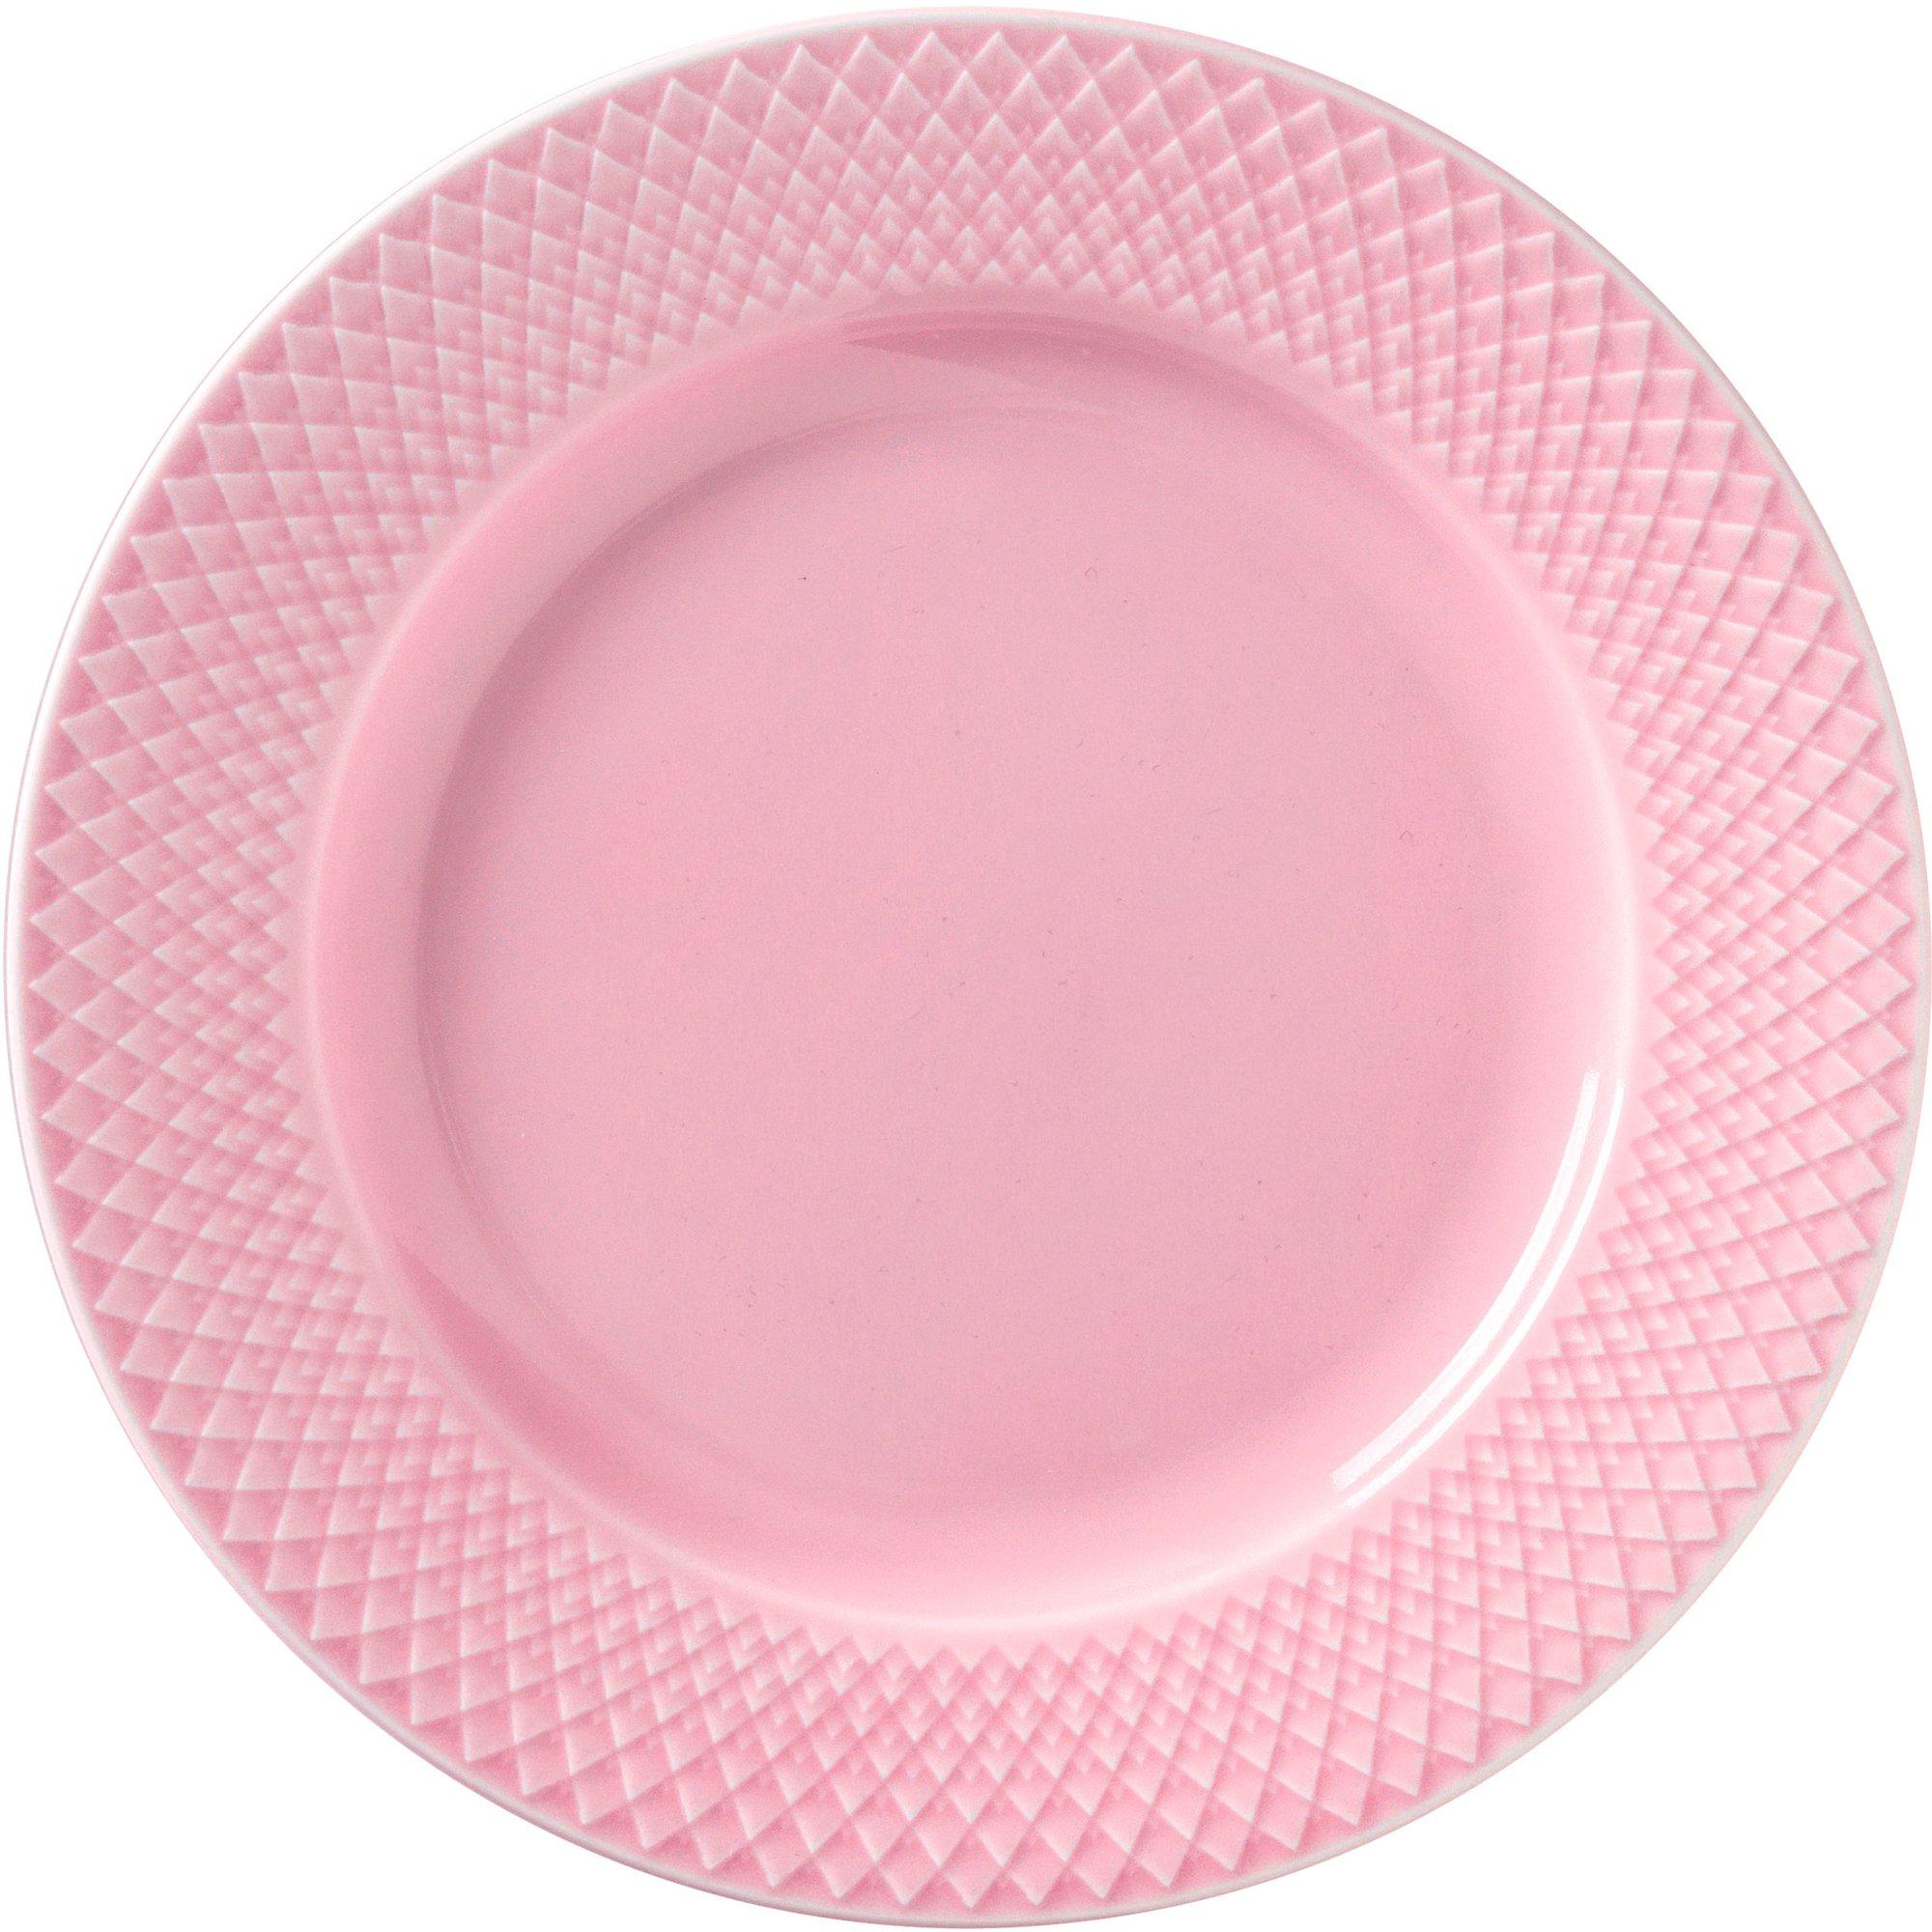 Lyngby Porcelæn Rhombe lunchtallrik